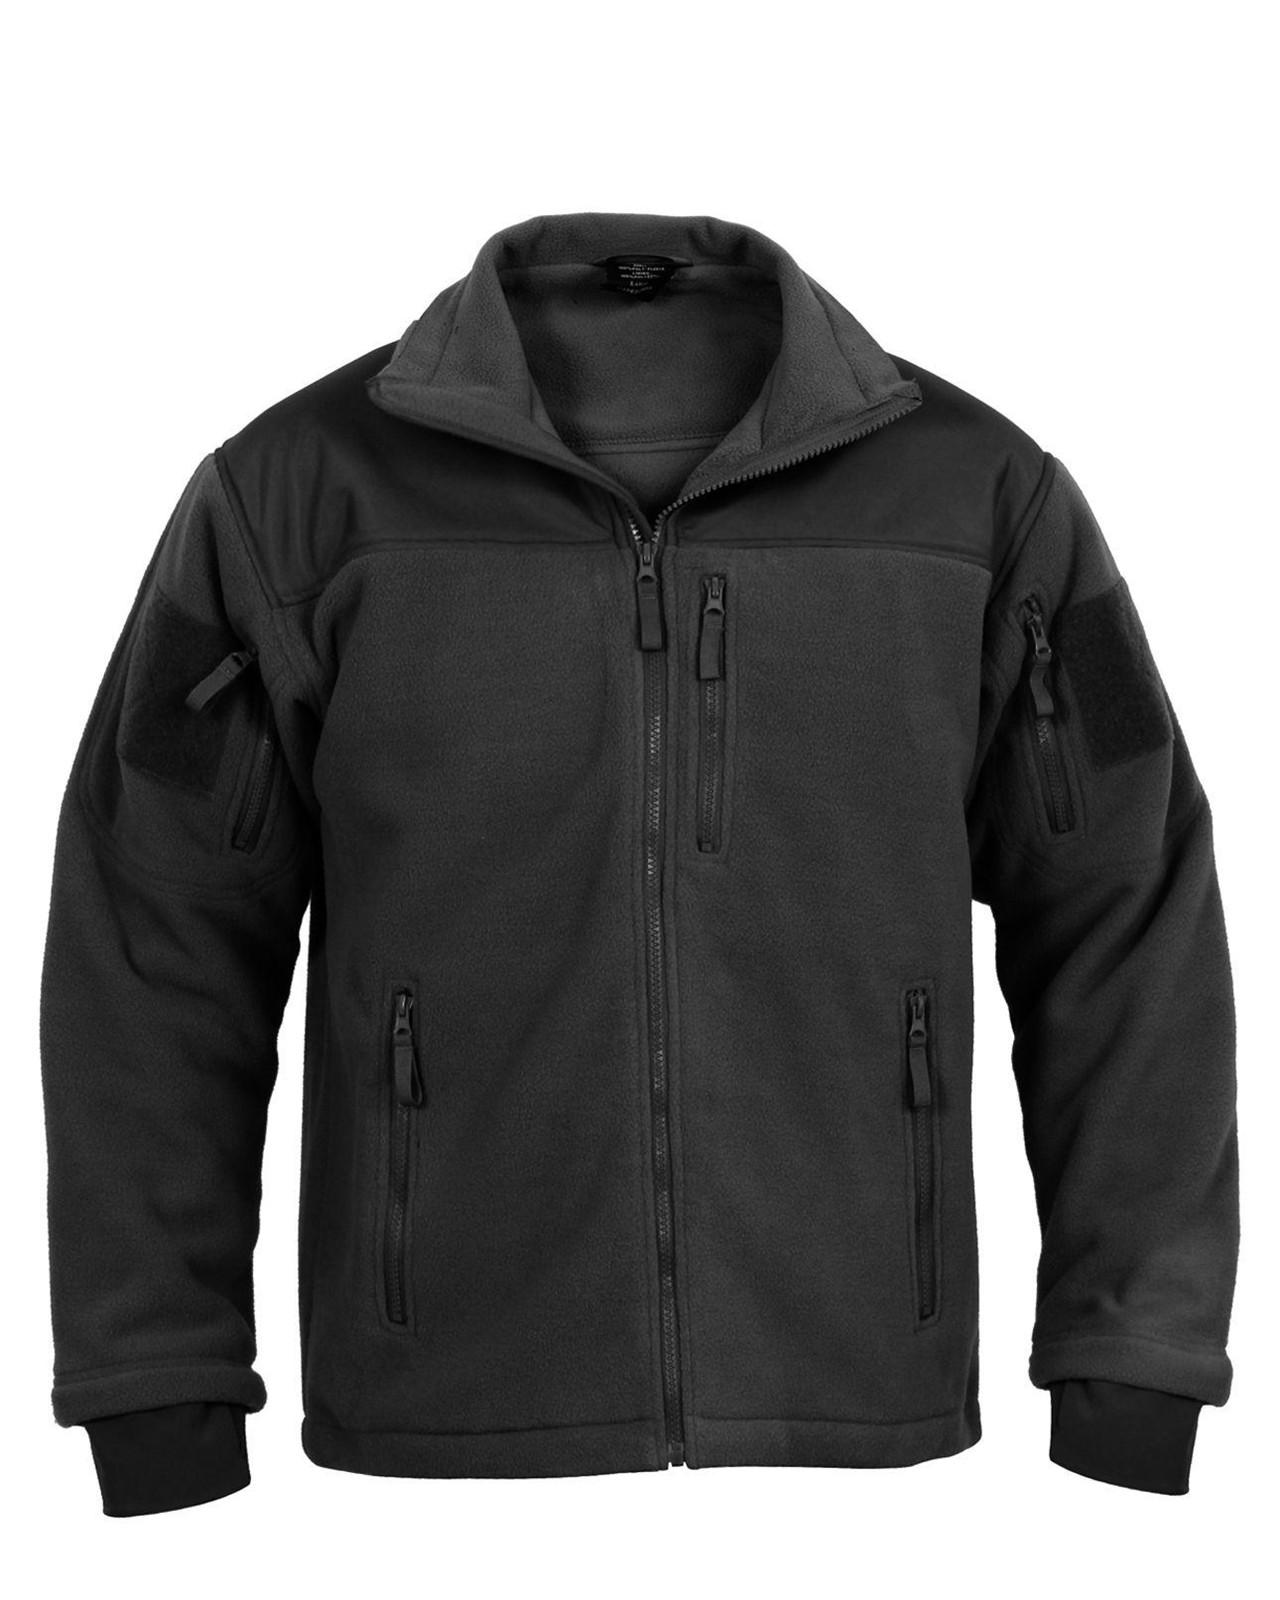 Fleece | Outdoor | Herre | Køb varme fleece trøjer